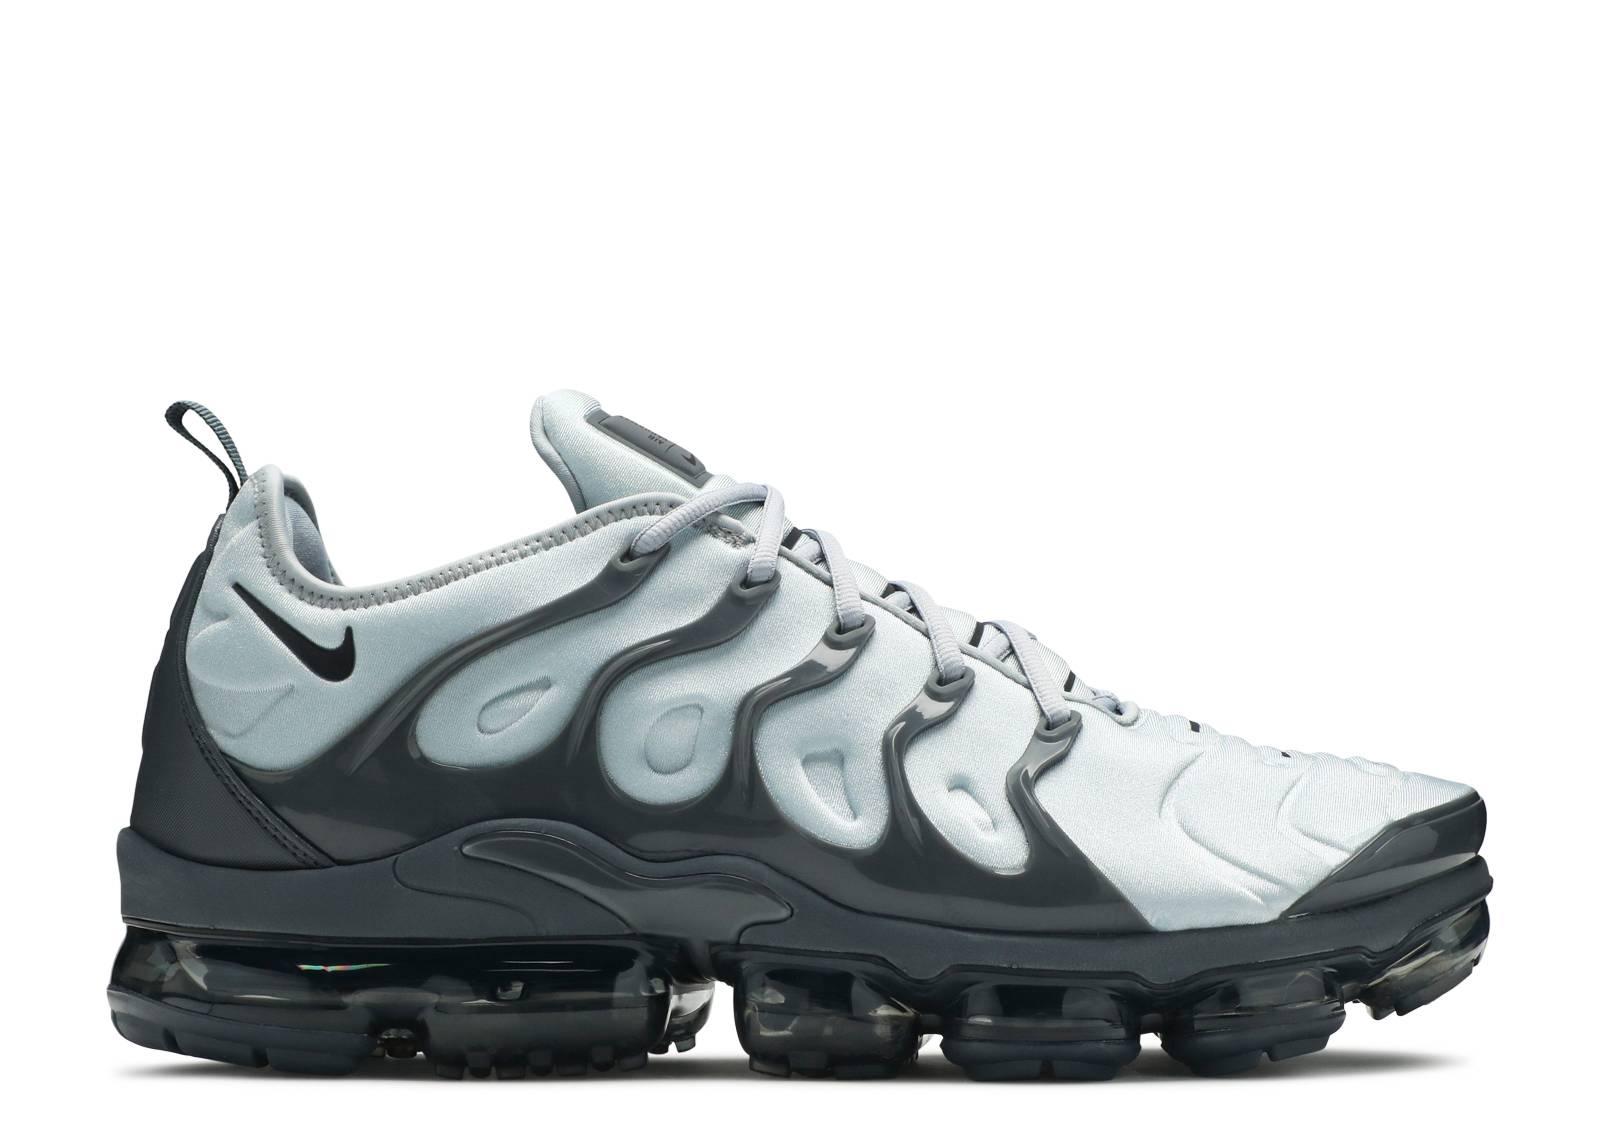 8e1f80d5e7 Air Vapormax Plus - Nike - 924453 016 - wolf grey/black-dark grey ...